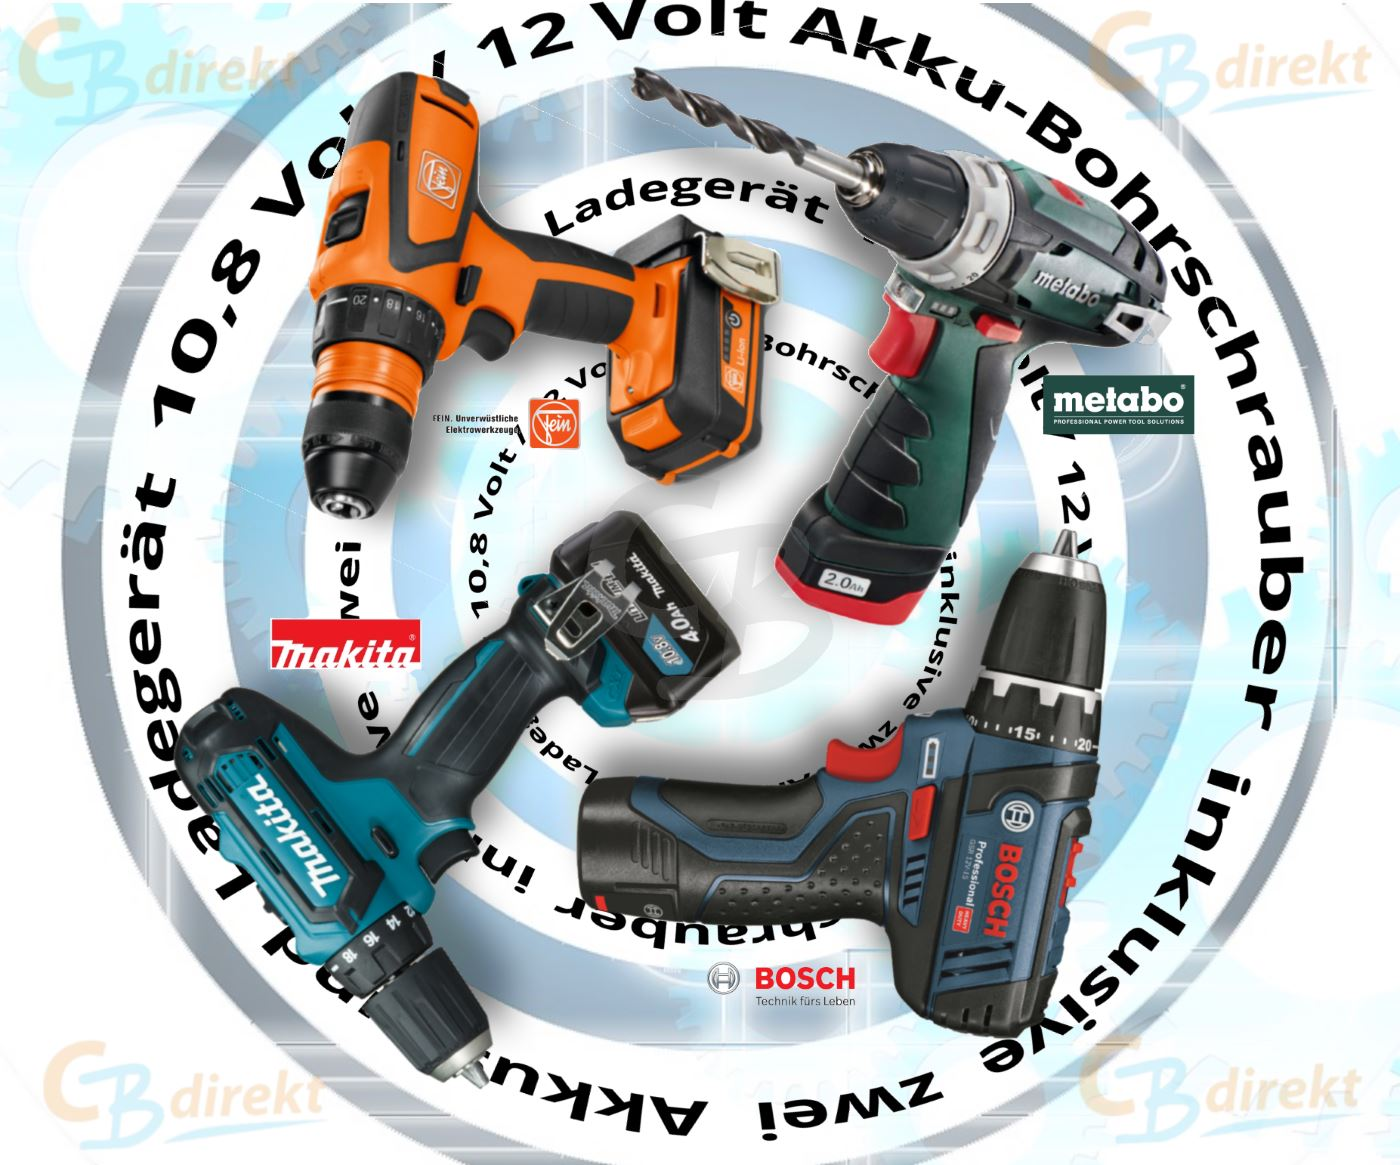 Vergleich Akku-Bohrschrauber 10,8 Volt bzw. 12 Volt Bosch Fein Makita Metabo